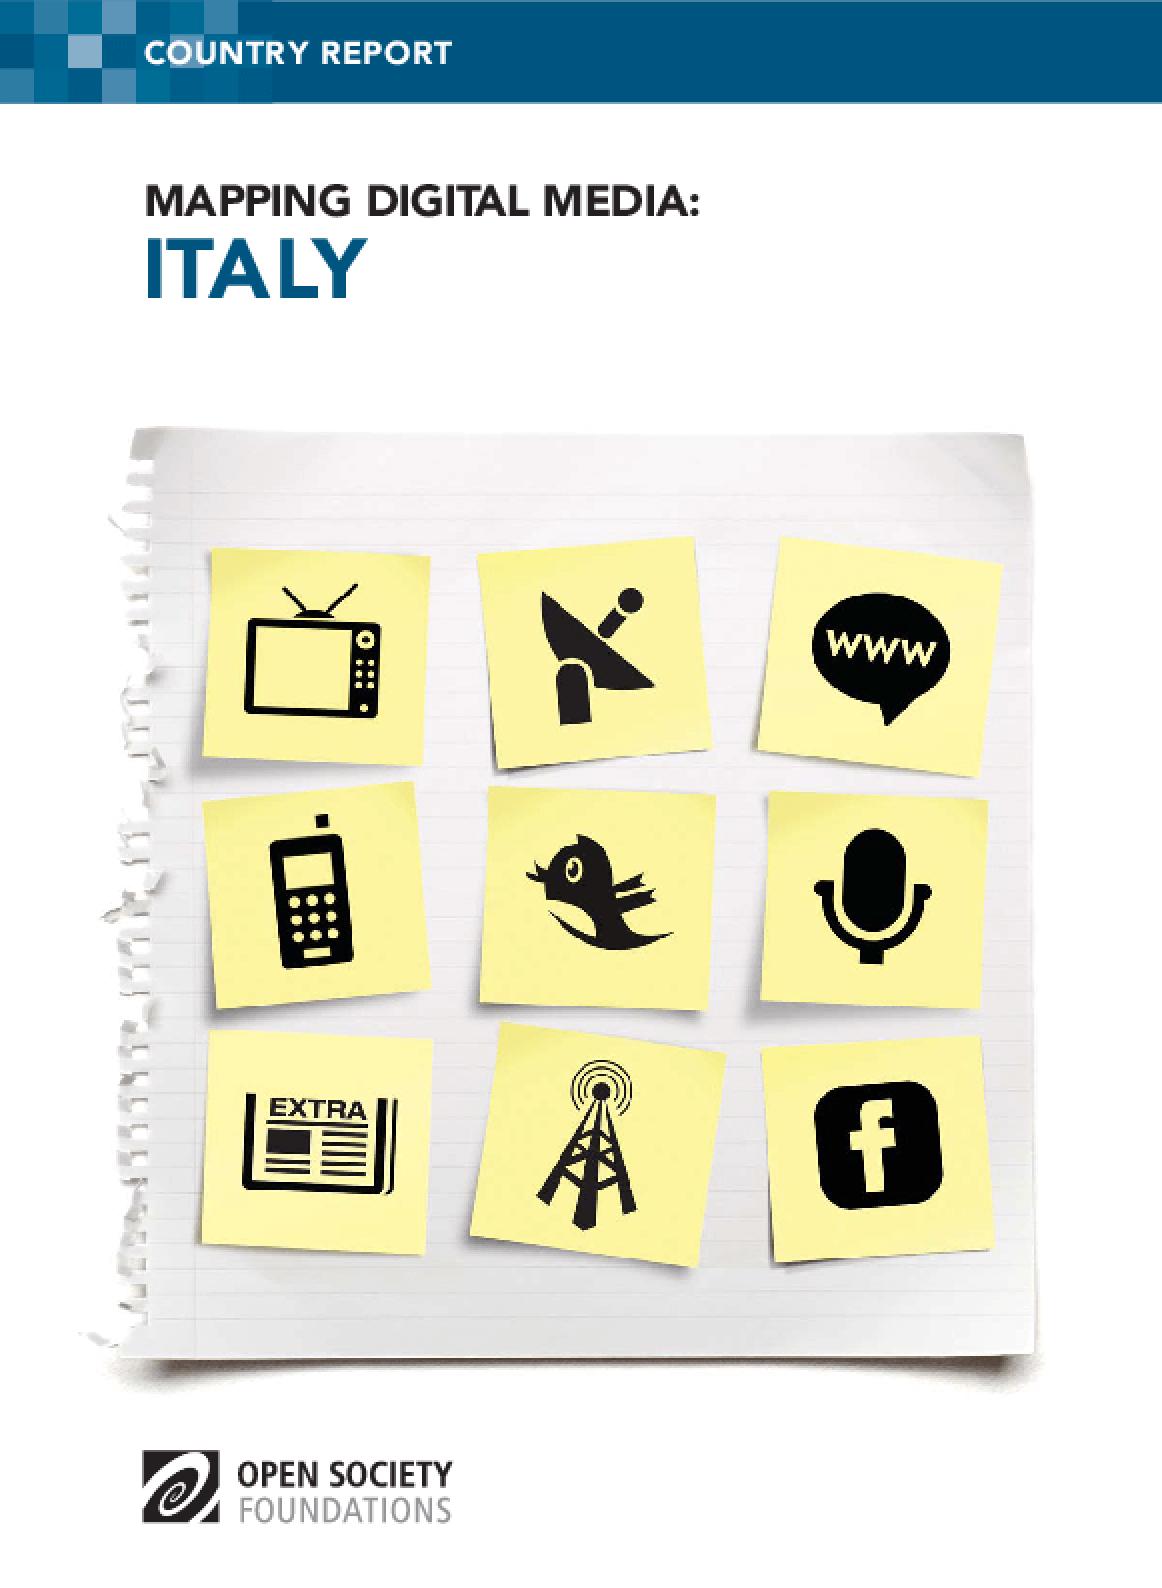 Mapping Digital Media: Italy